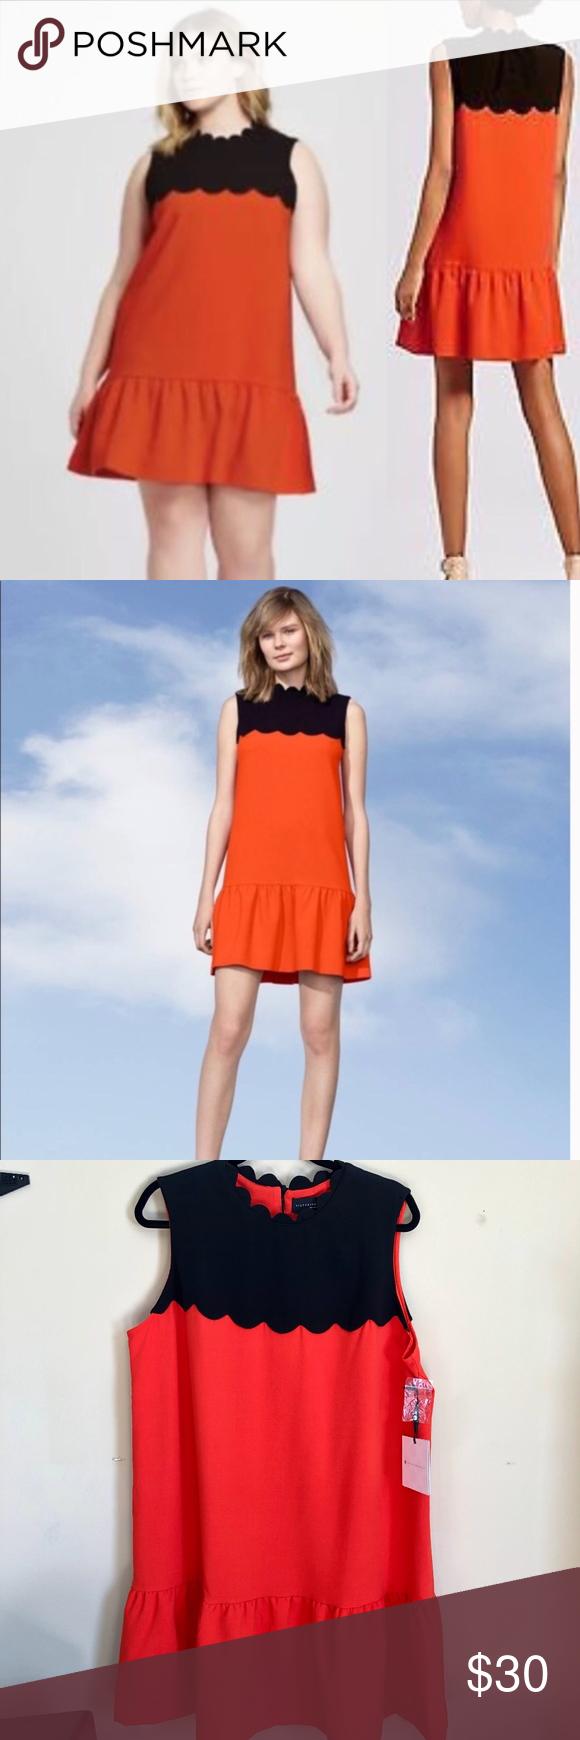 Nwt Victoria Beckham X Target Orange Black Dress Black Scallop Dress Dresses Target Dresses [ 1740 x 580 Pixel ]